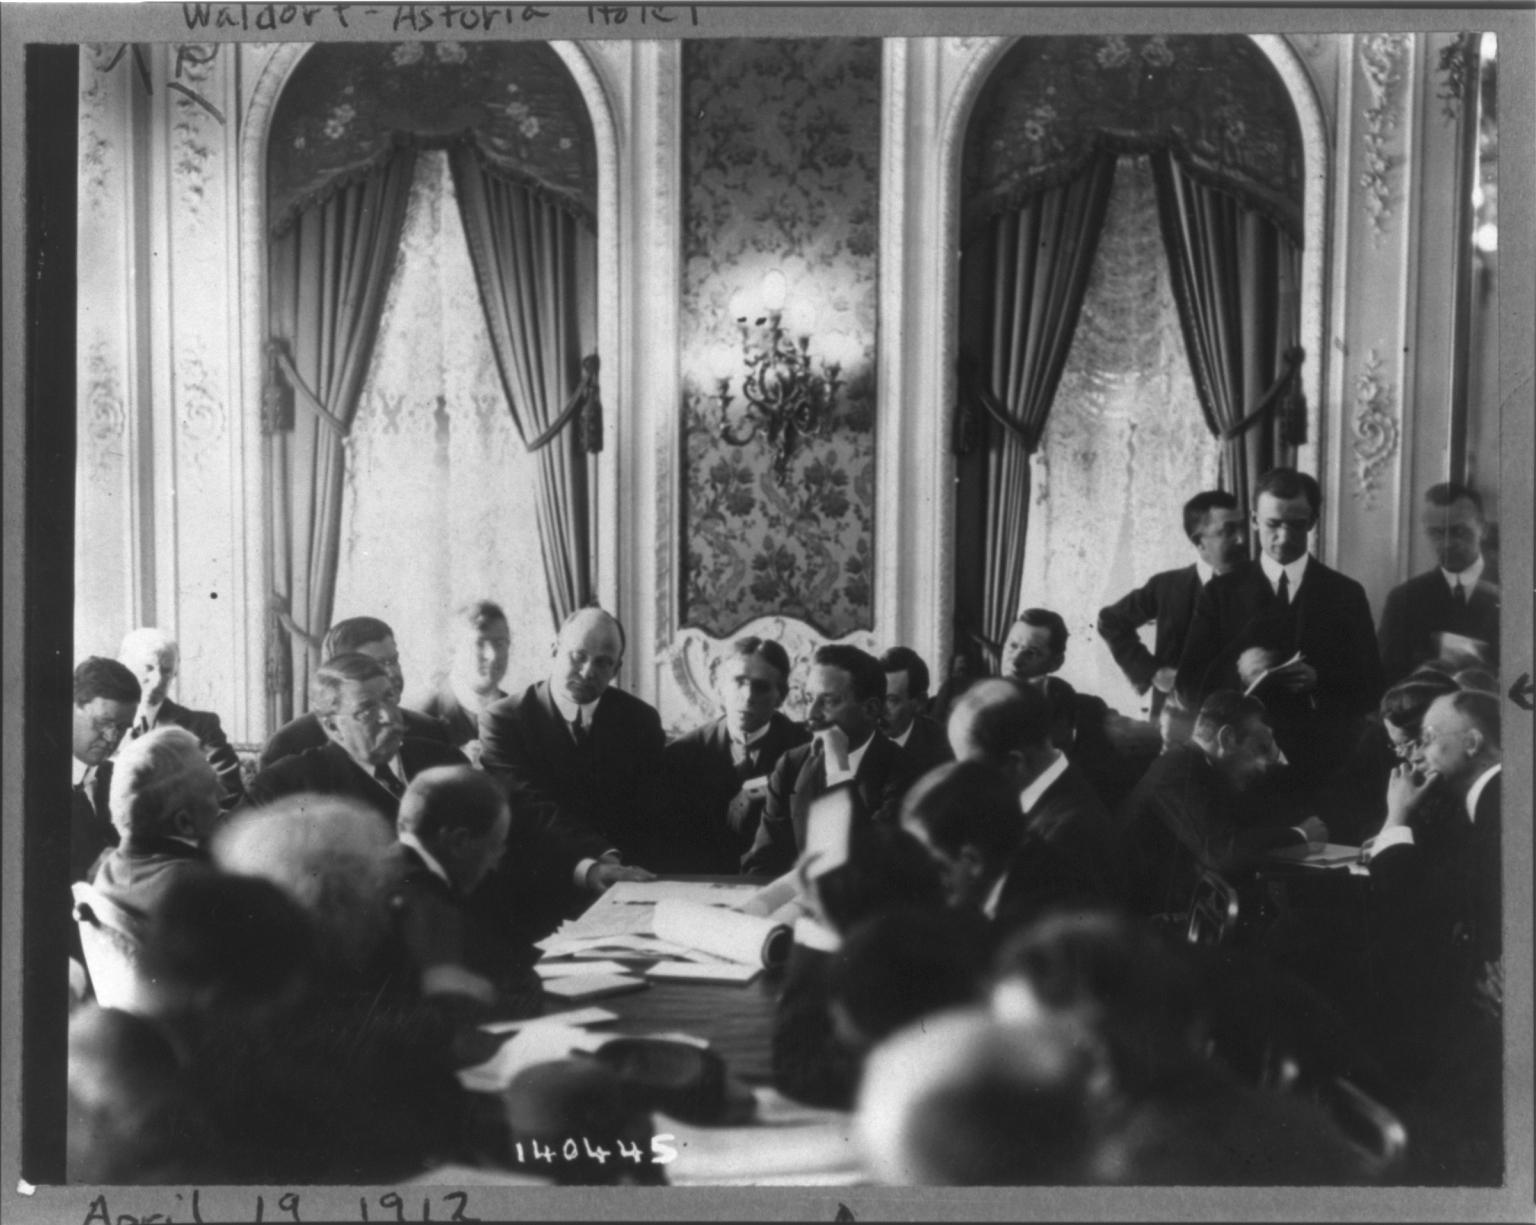 Titanic Disaster Hearings held at the Waldorf Astoria New York, April 19, 1912.